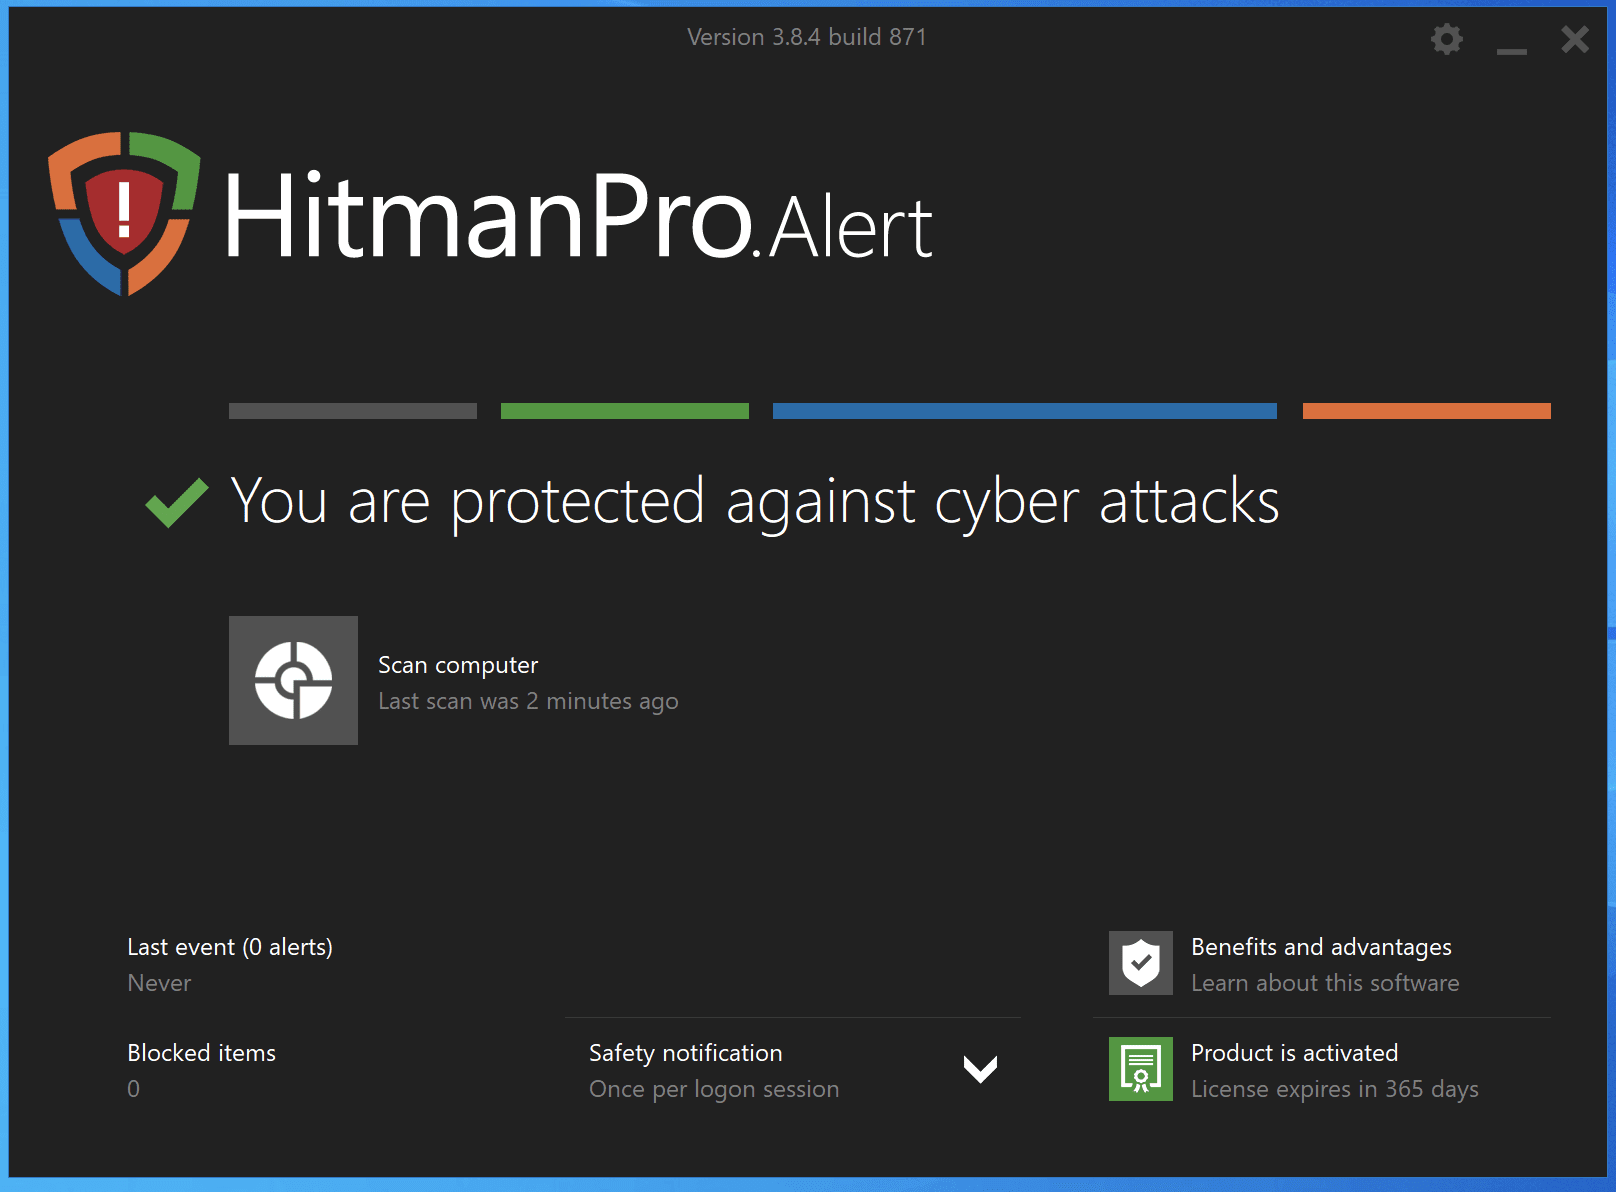 HitmanPro.Alert Scan Completed Screenshot